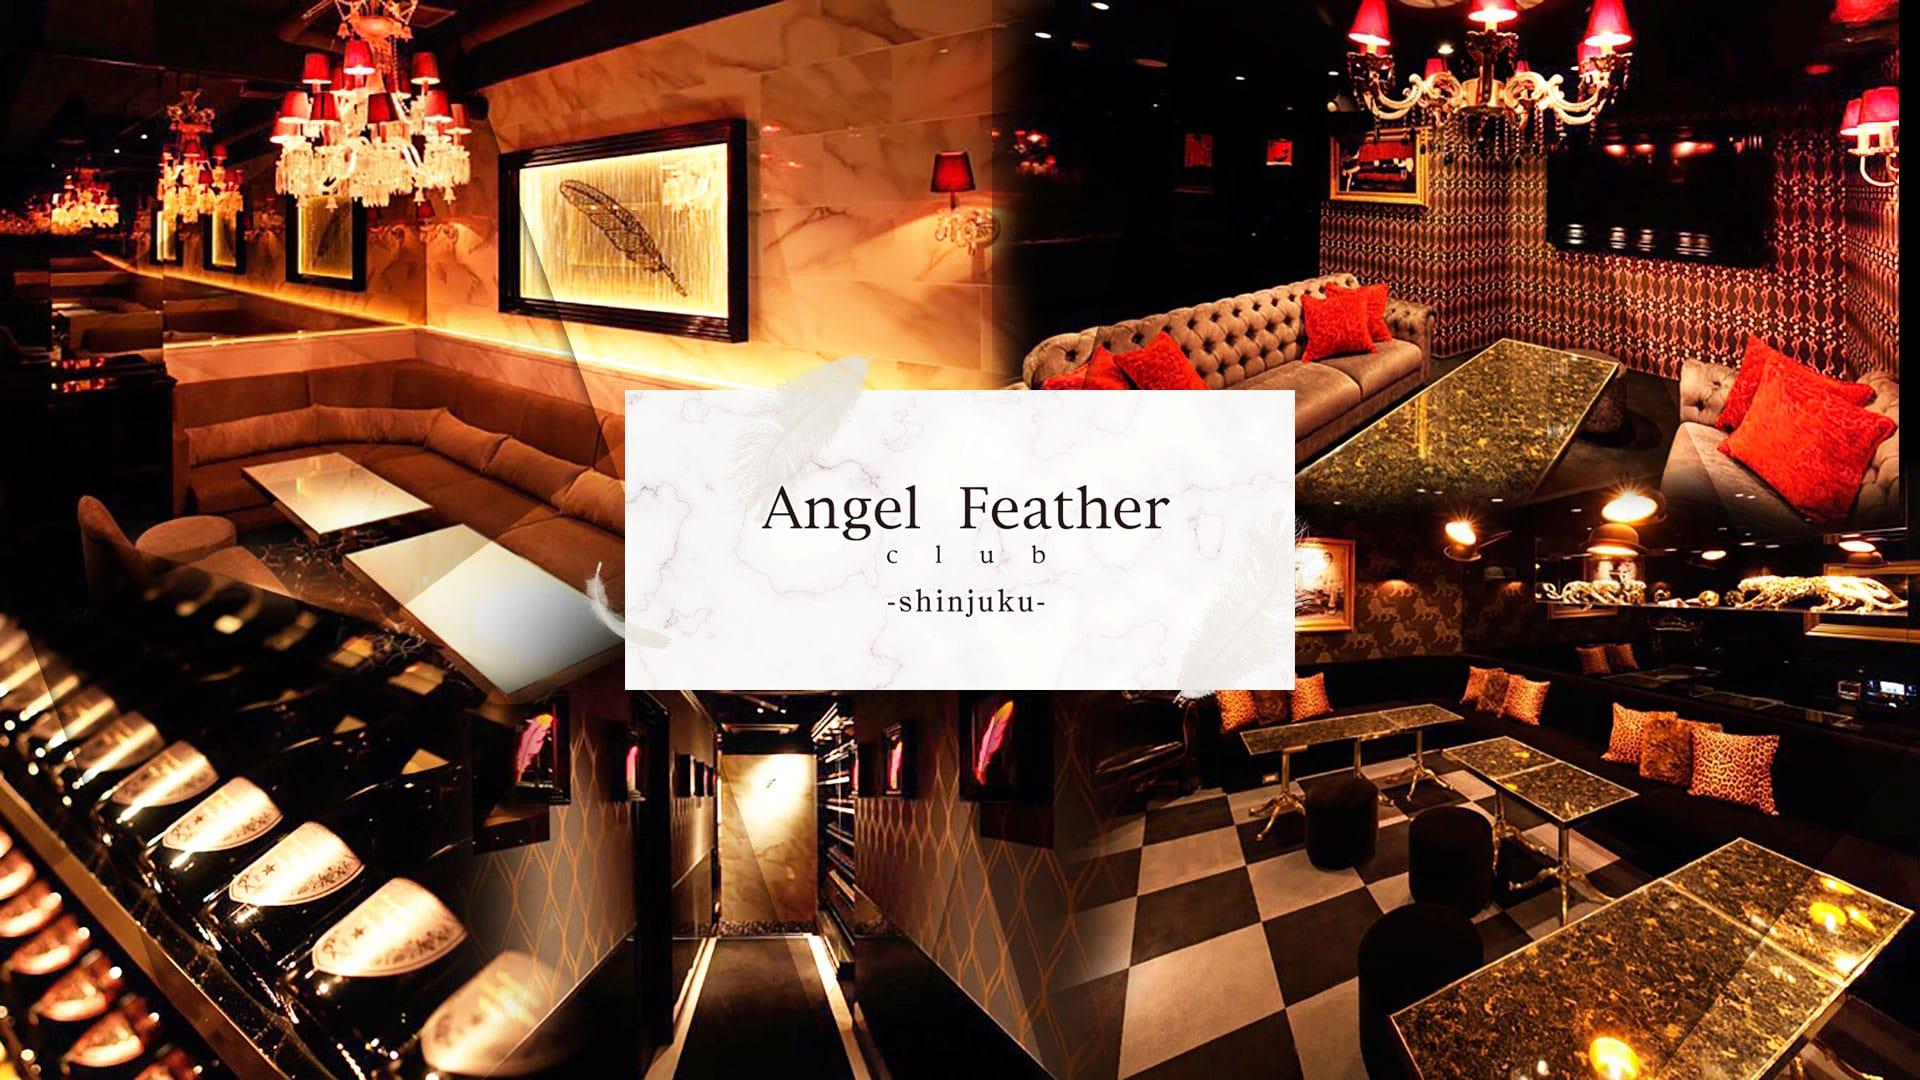 Angel Feather  新宿-エンジェルフェザーシンジュク-【公式】 TOP画像